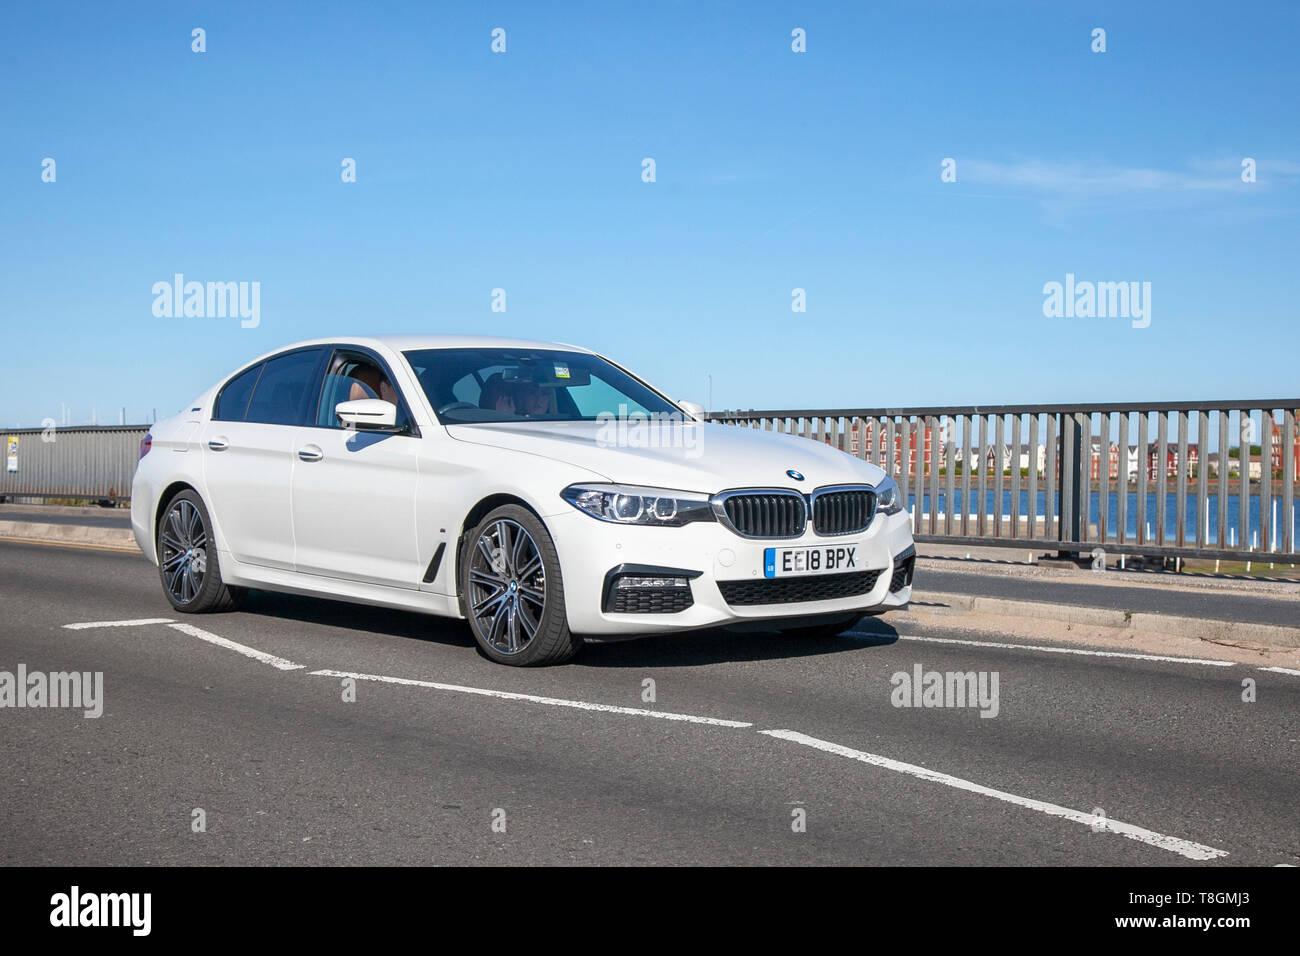 White 2018 BMW 530E M Sport Auto  on the seafront promenade, Southport, Merseyside, UK - Stock Image